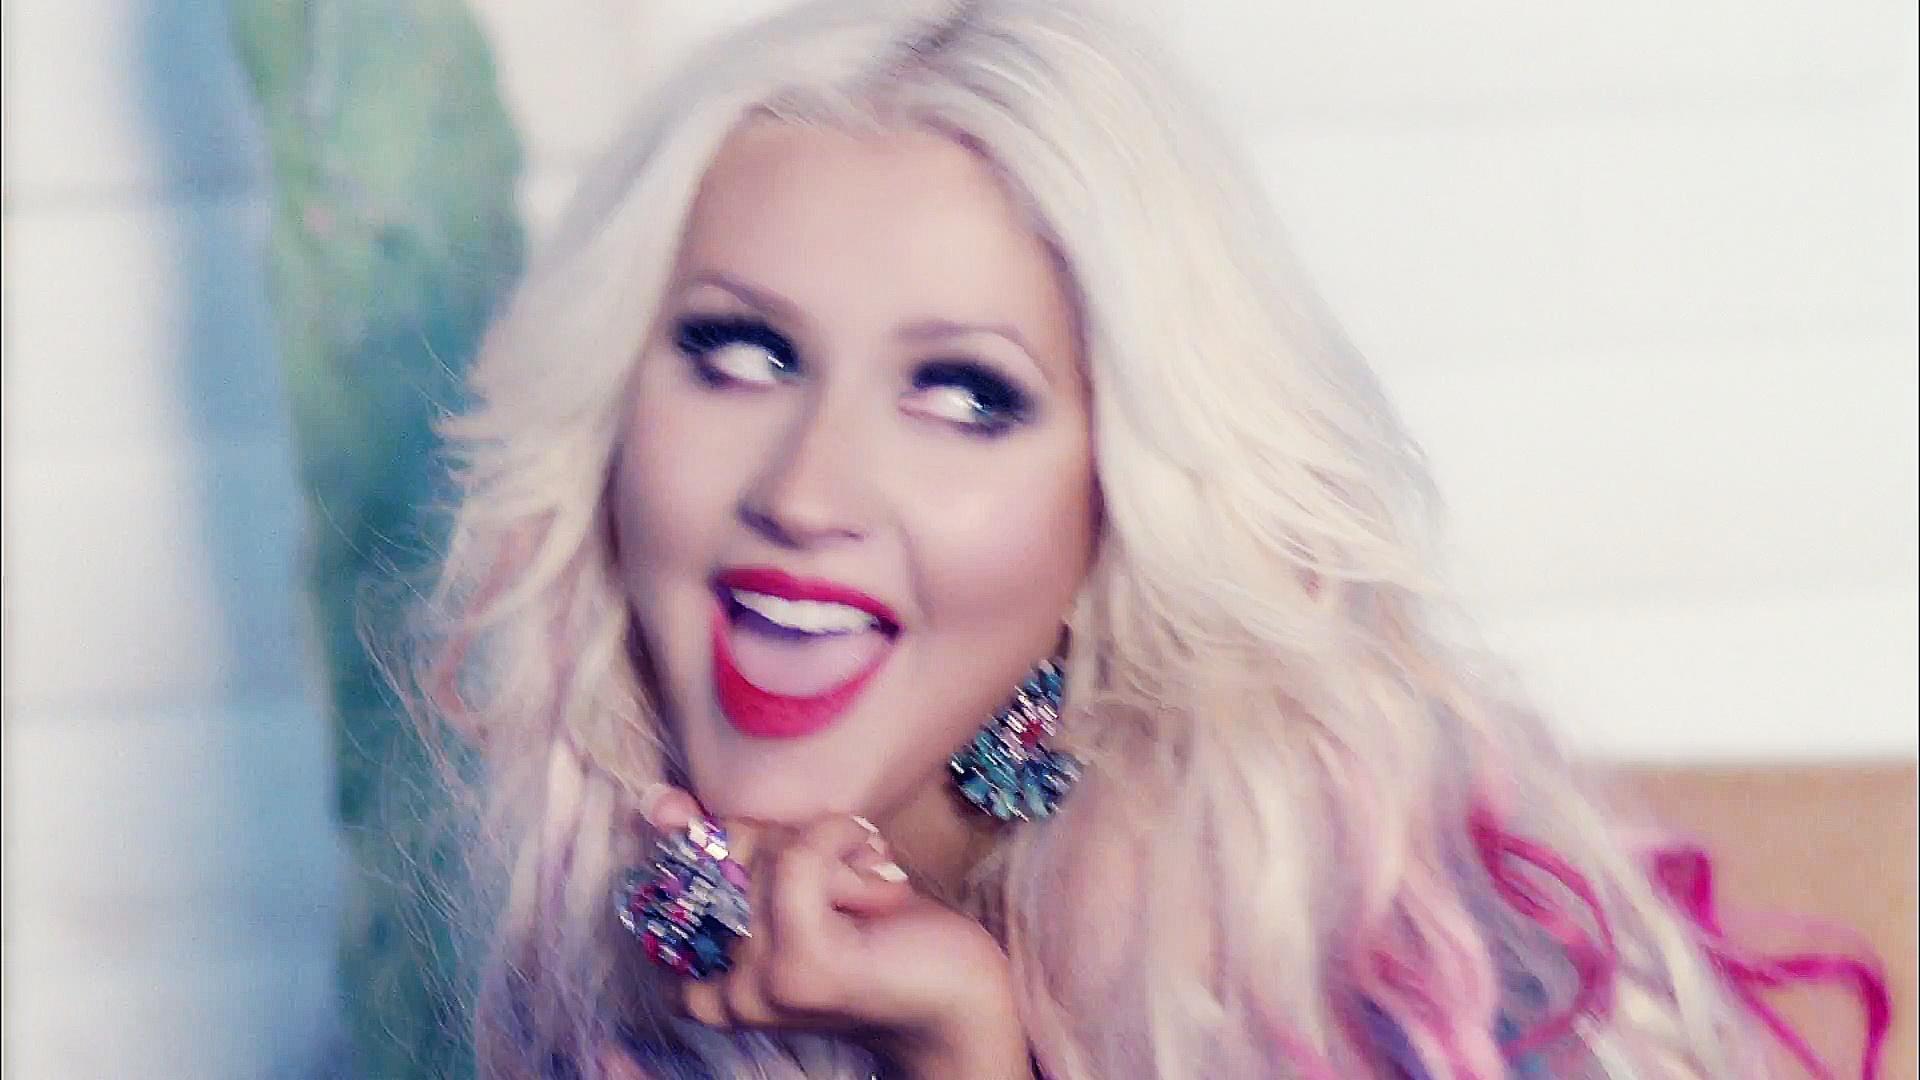 Christina-Aguilera-Your-Body-video-chris